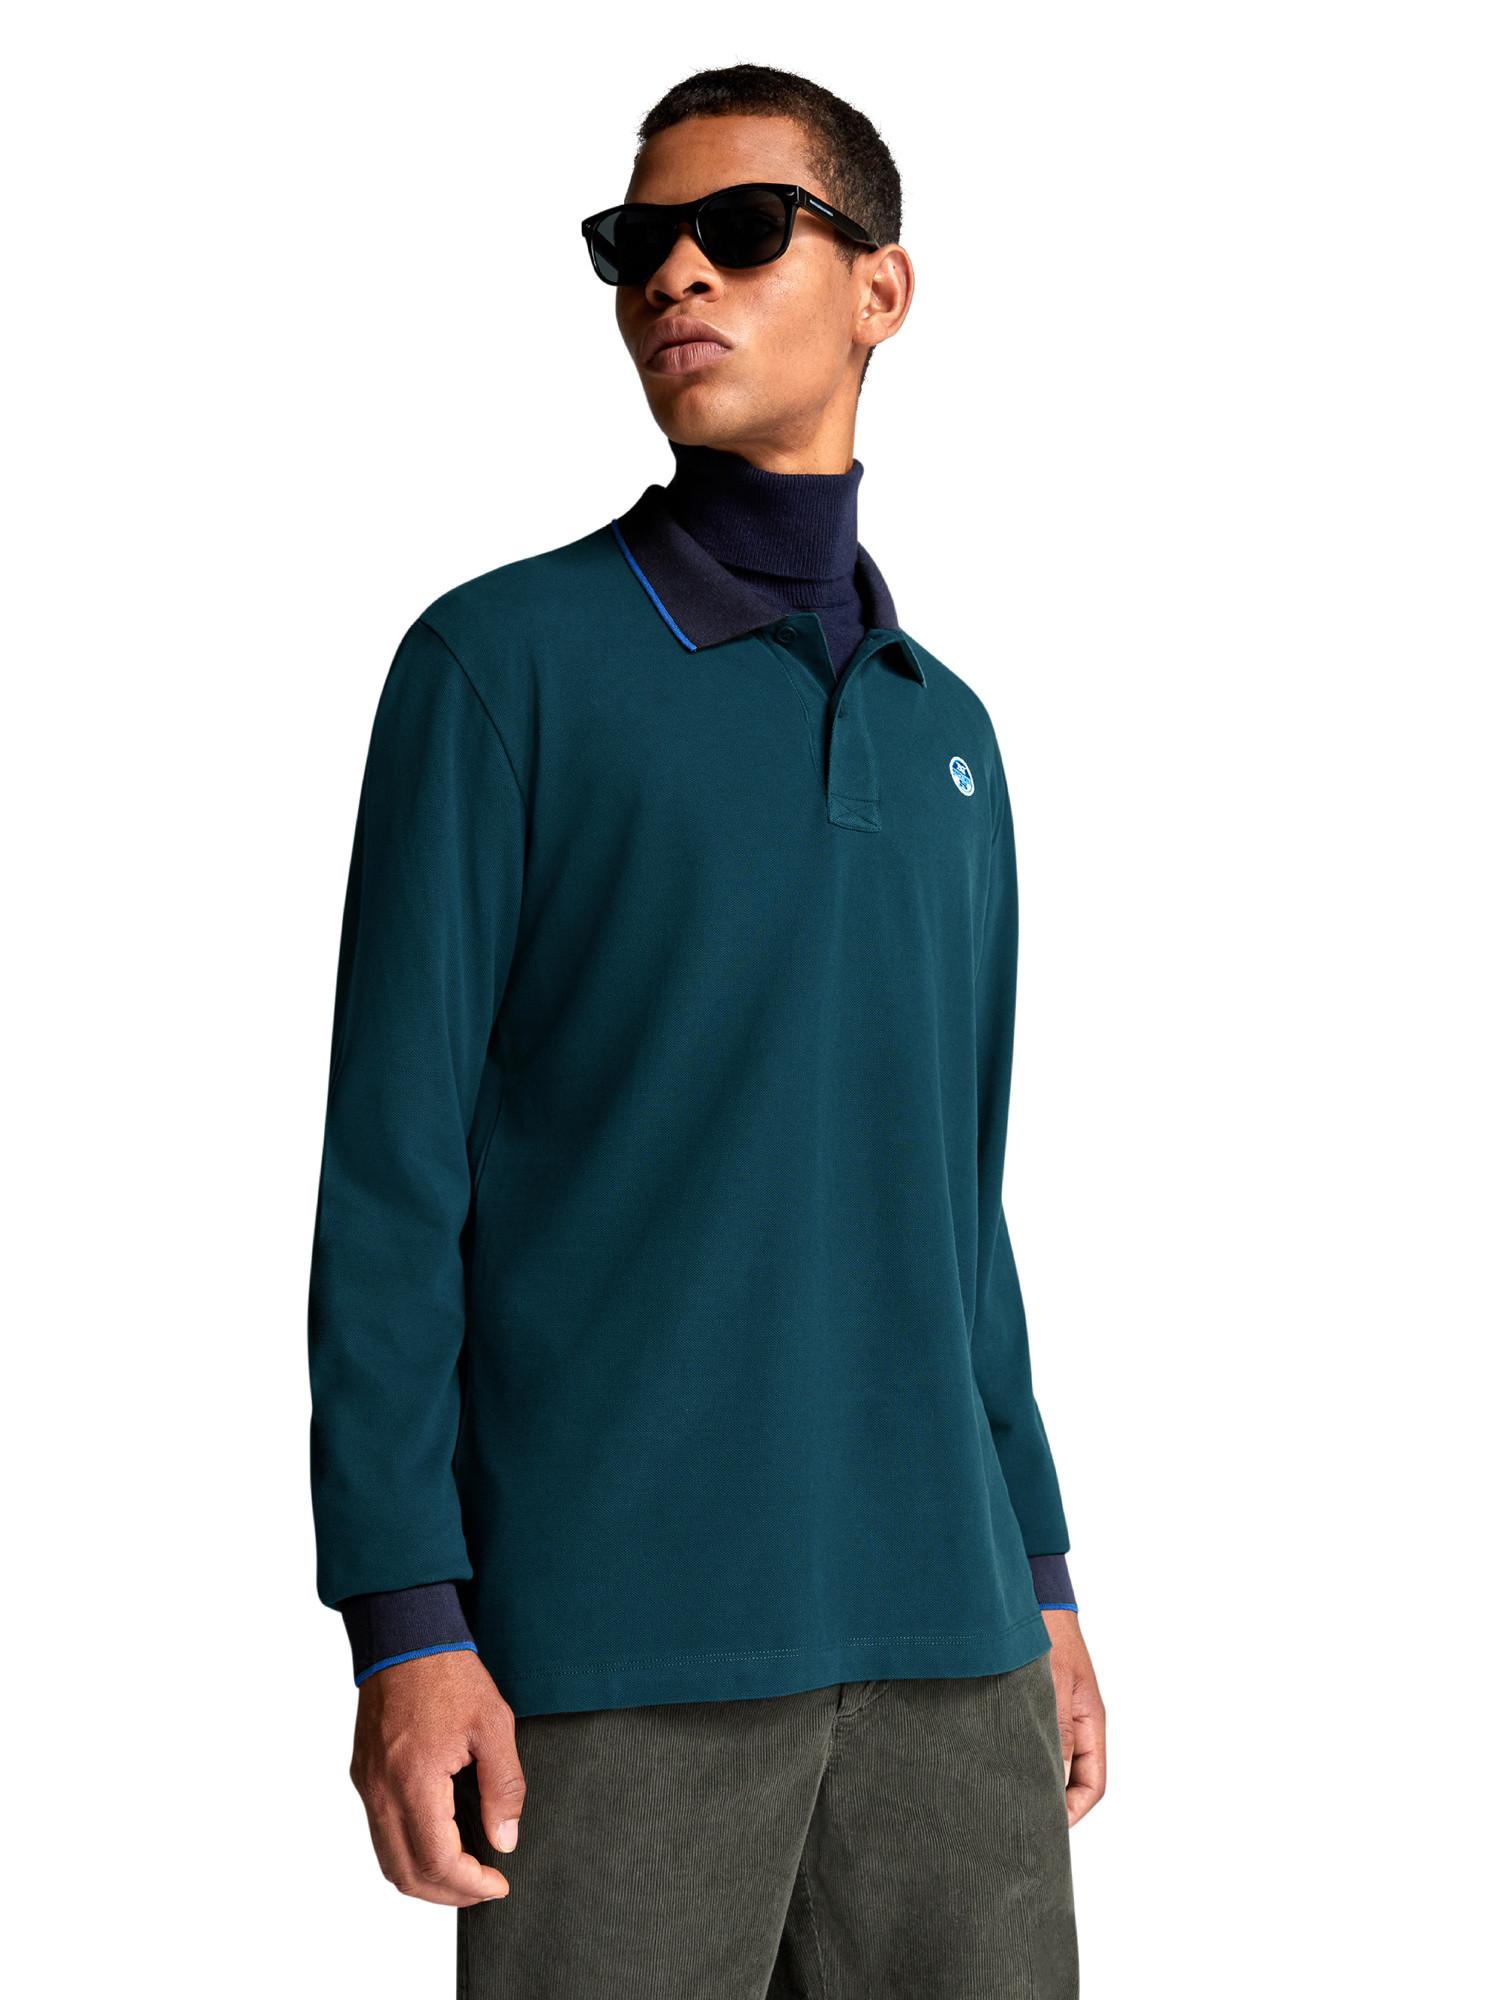 Polo con bordi a contrasto, Verde, large image number 4